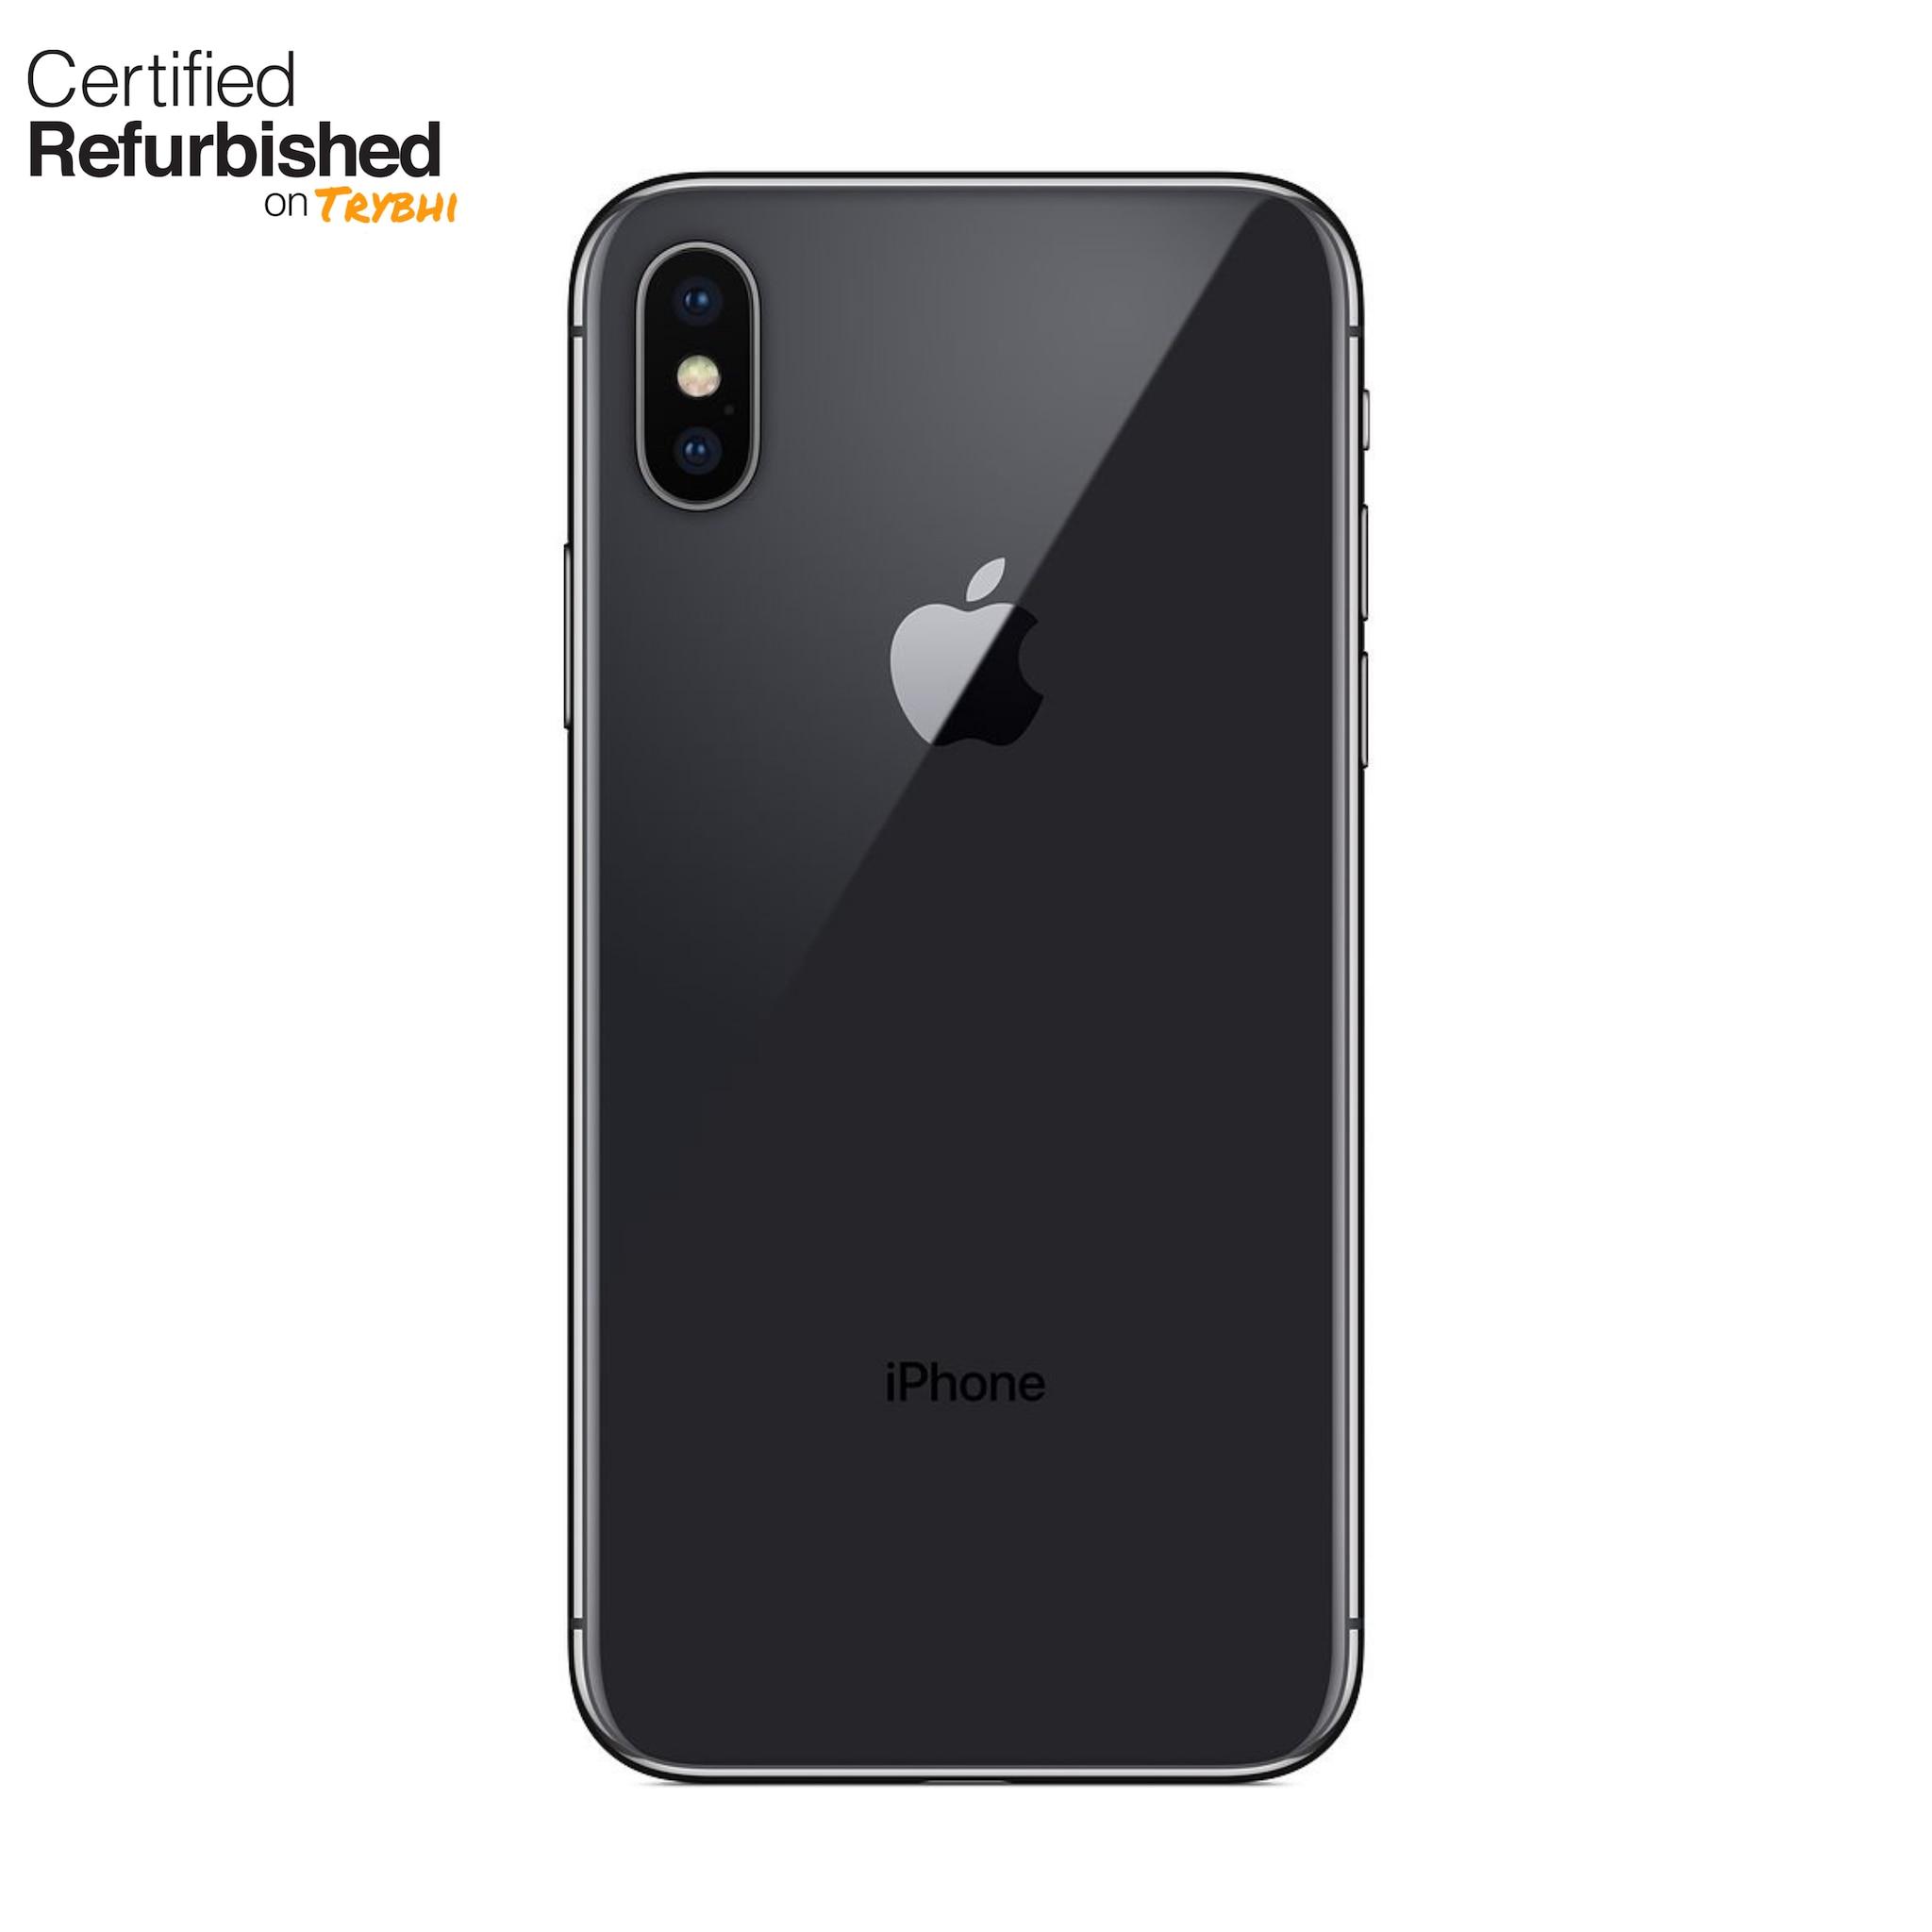 Refurbished Apple IPhone X 64GB - Space Gray (Unlocked)